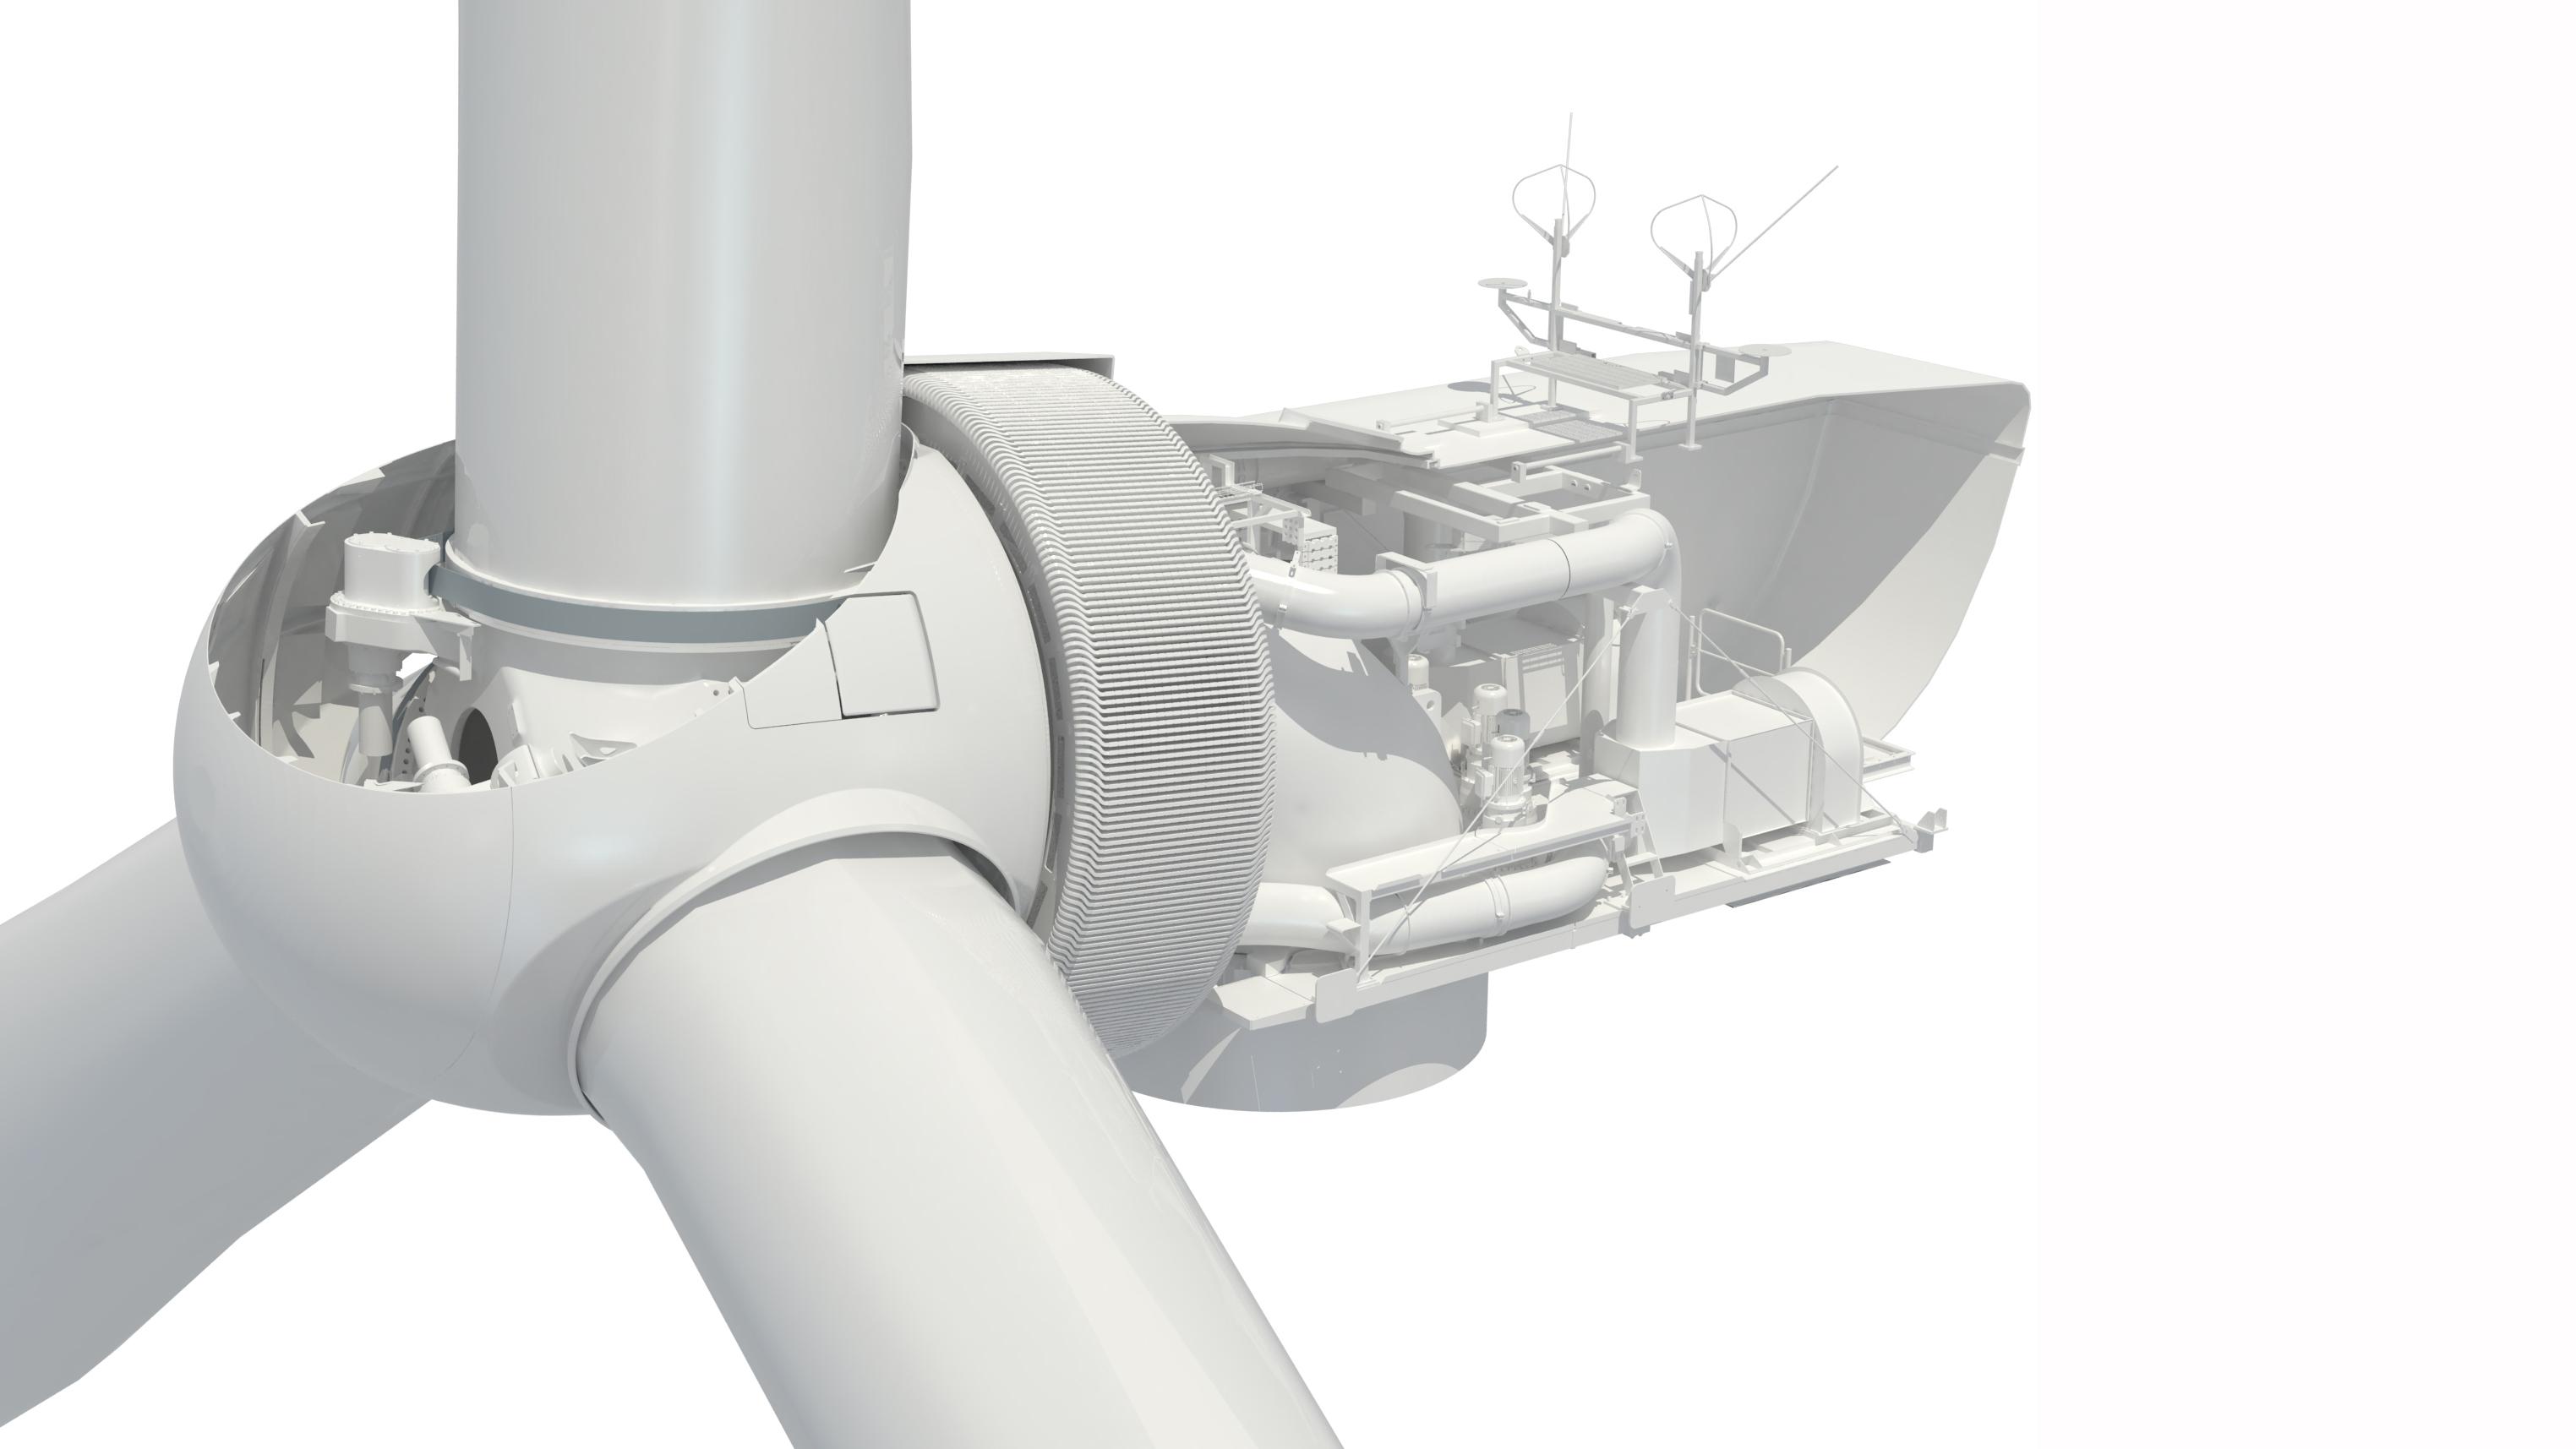 3 Turbine